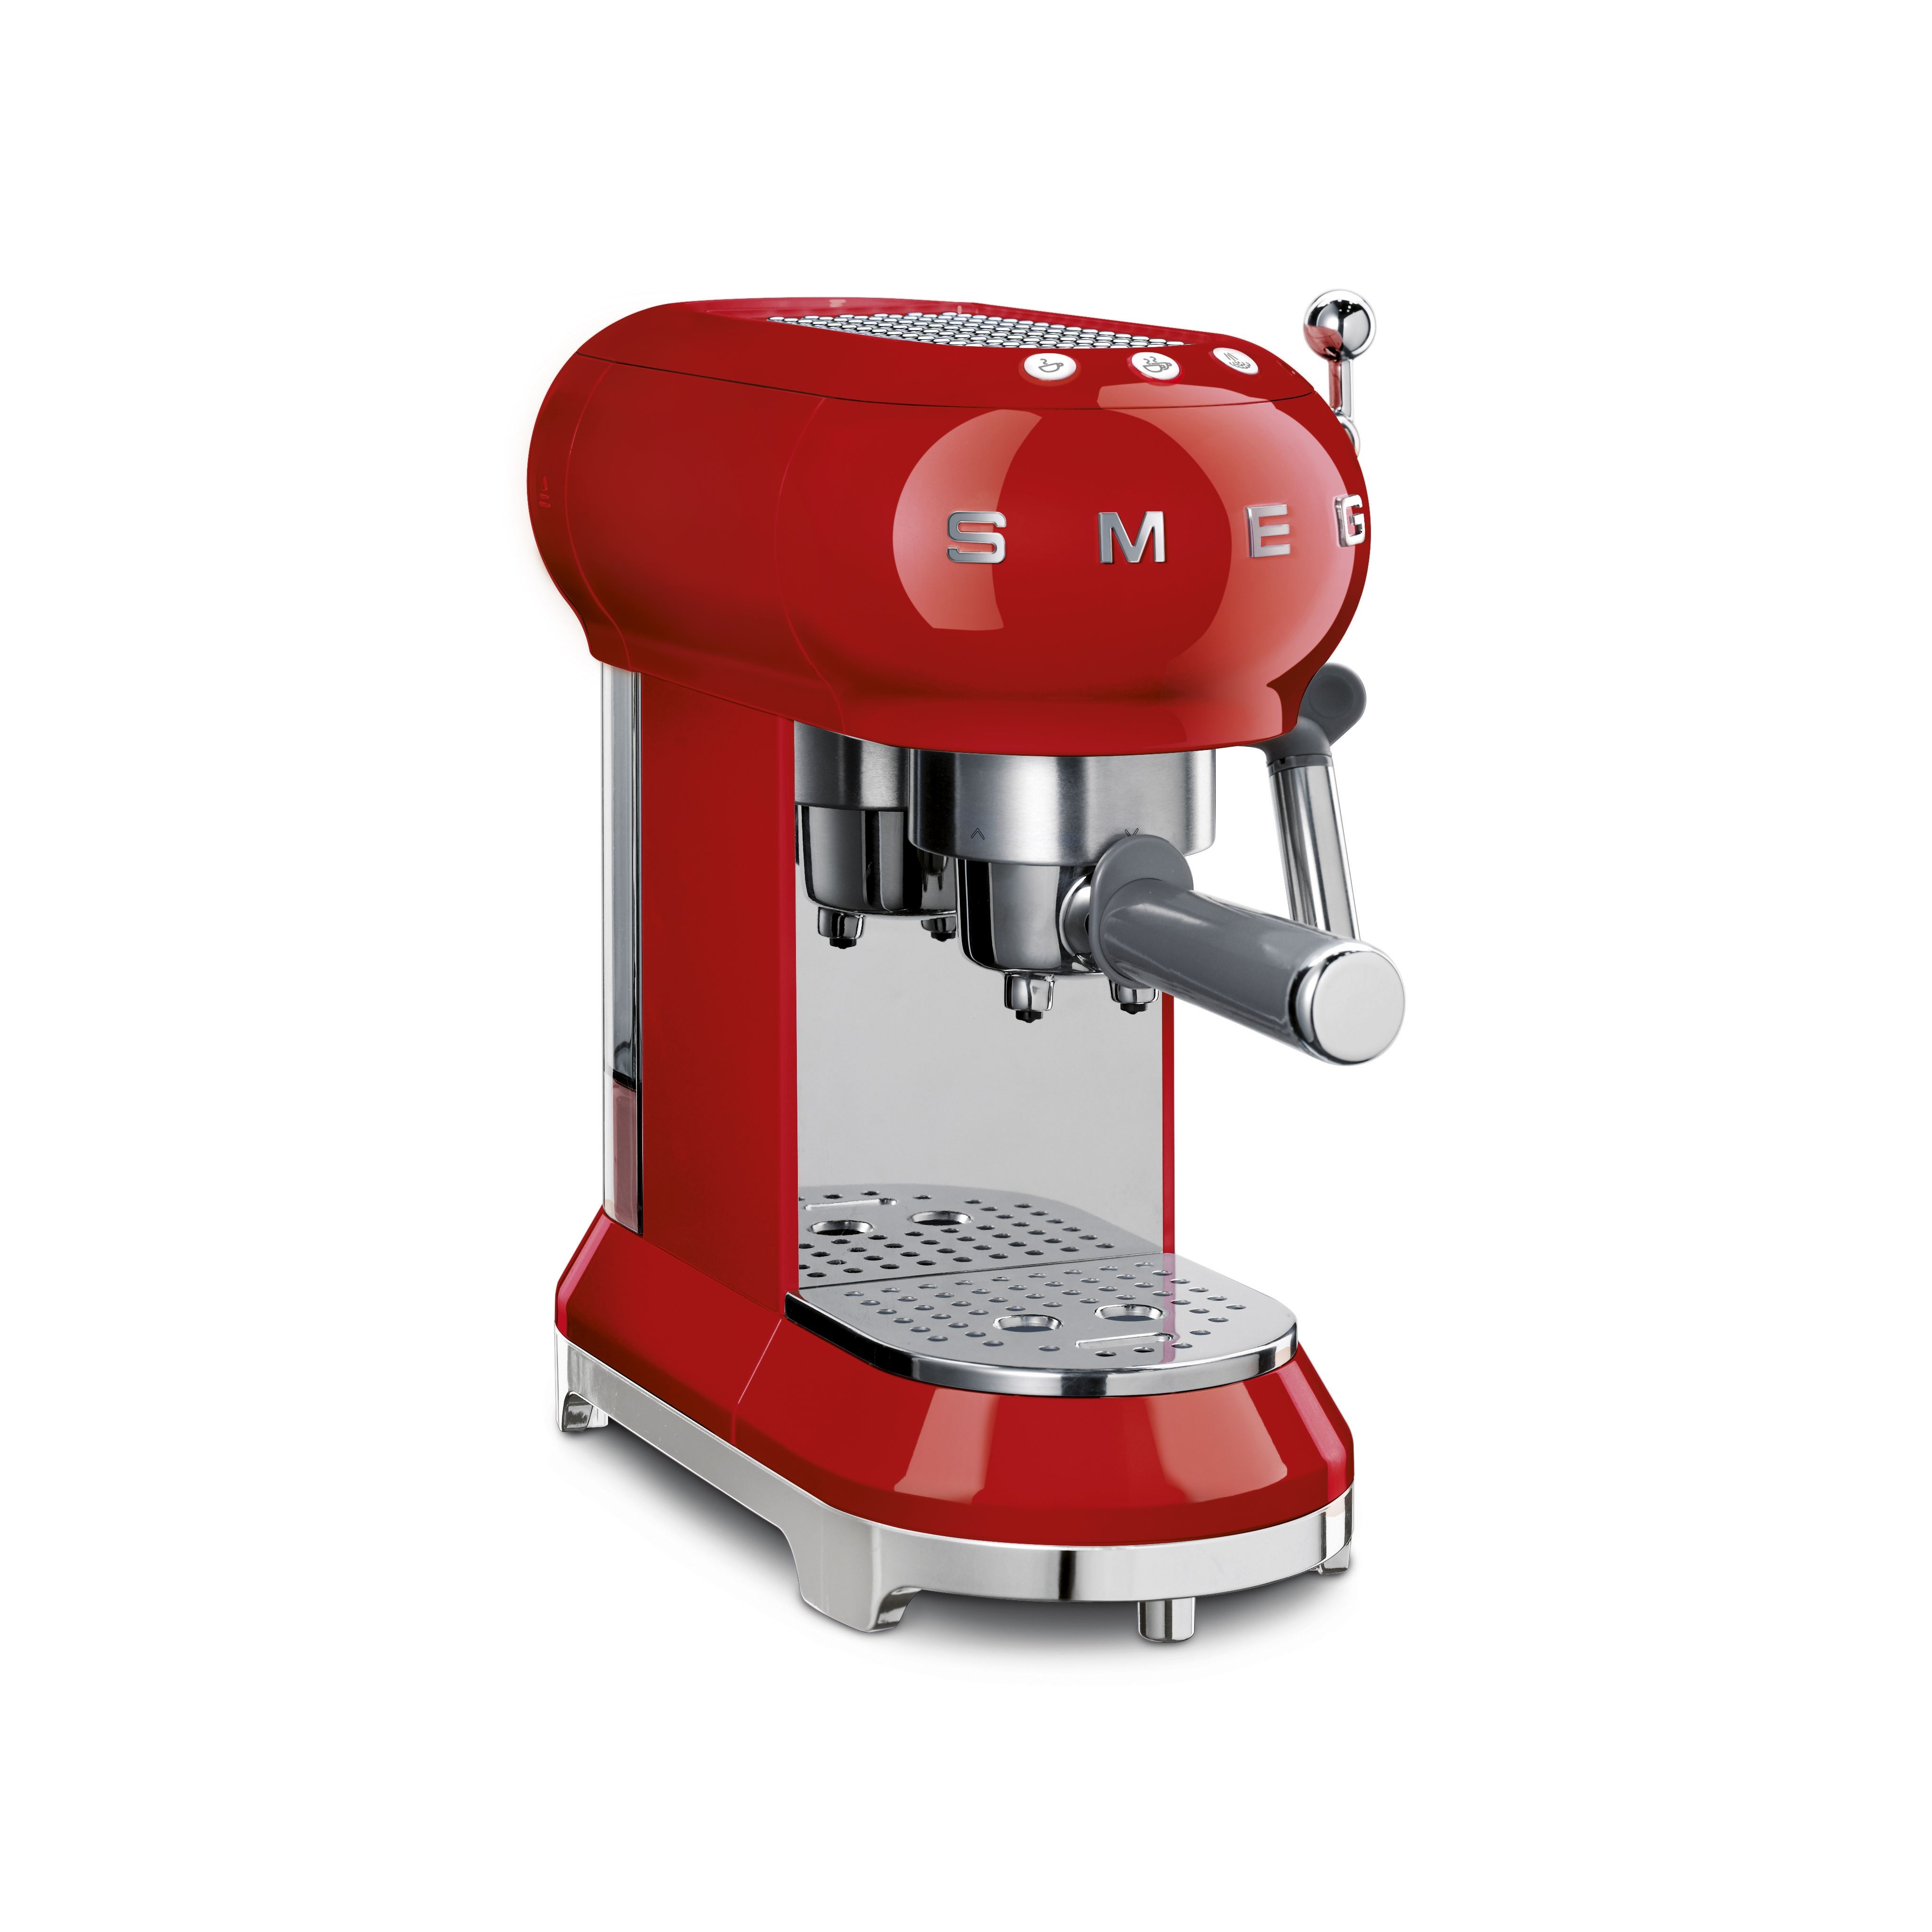 SMEG Espresso Kaffeemaschine 50's Retro Style